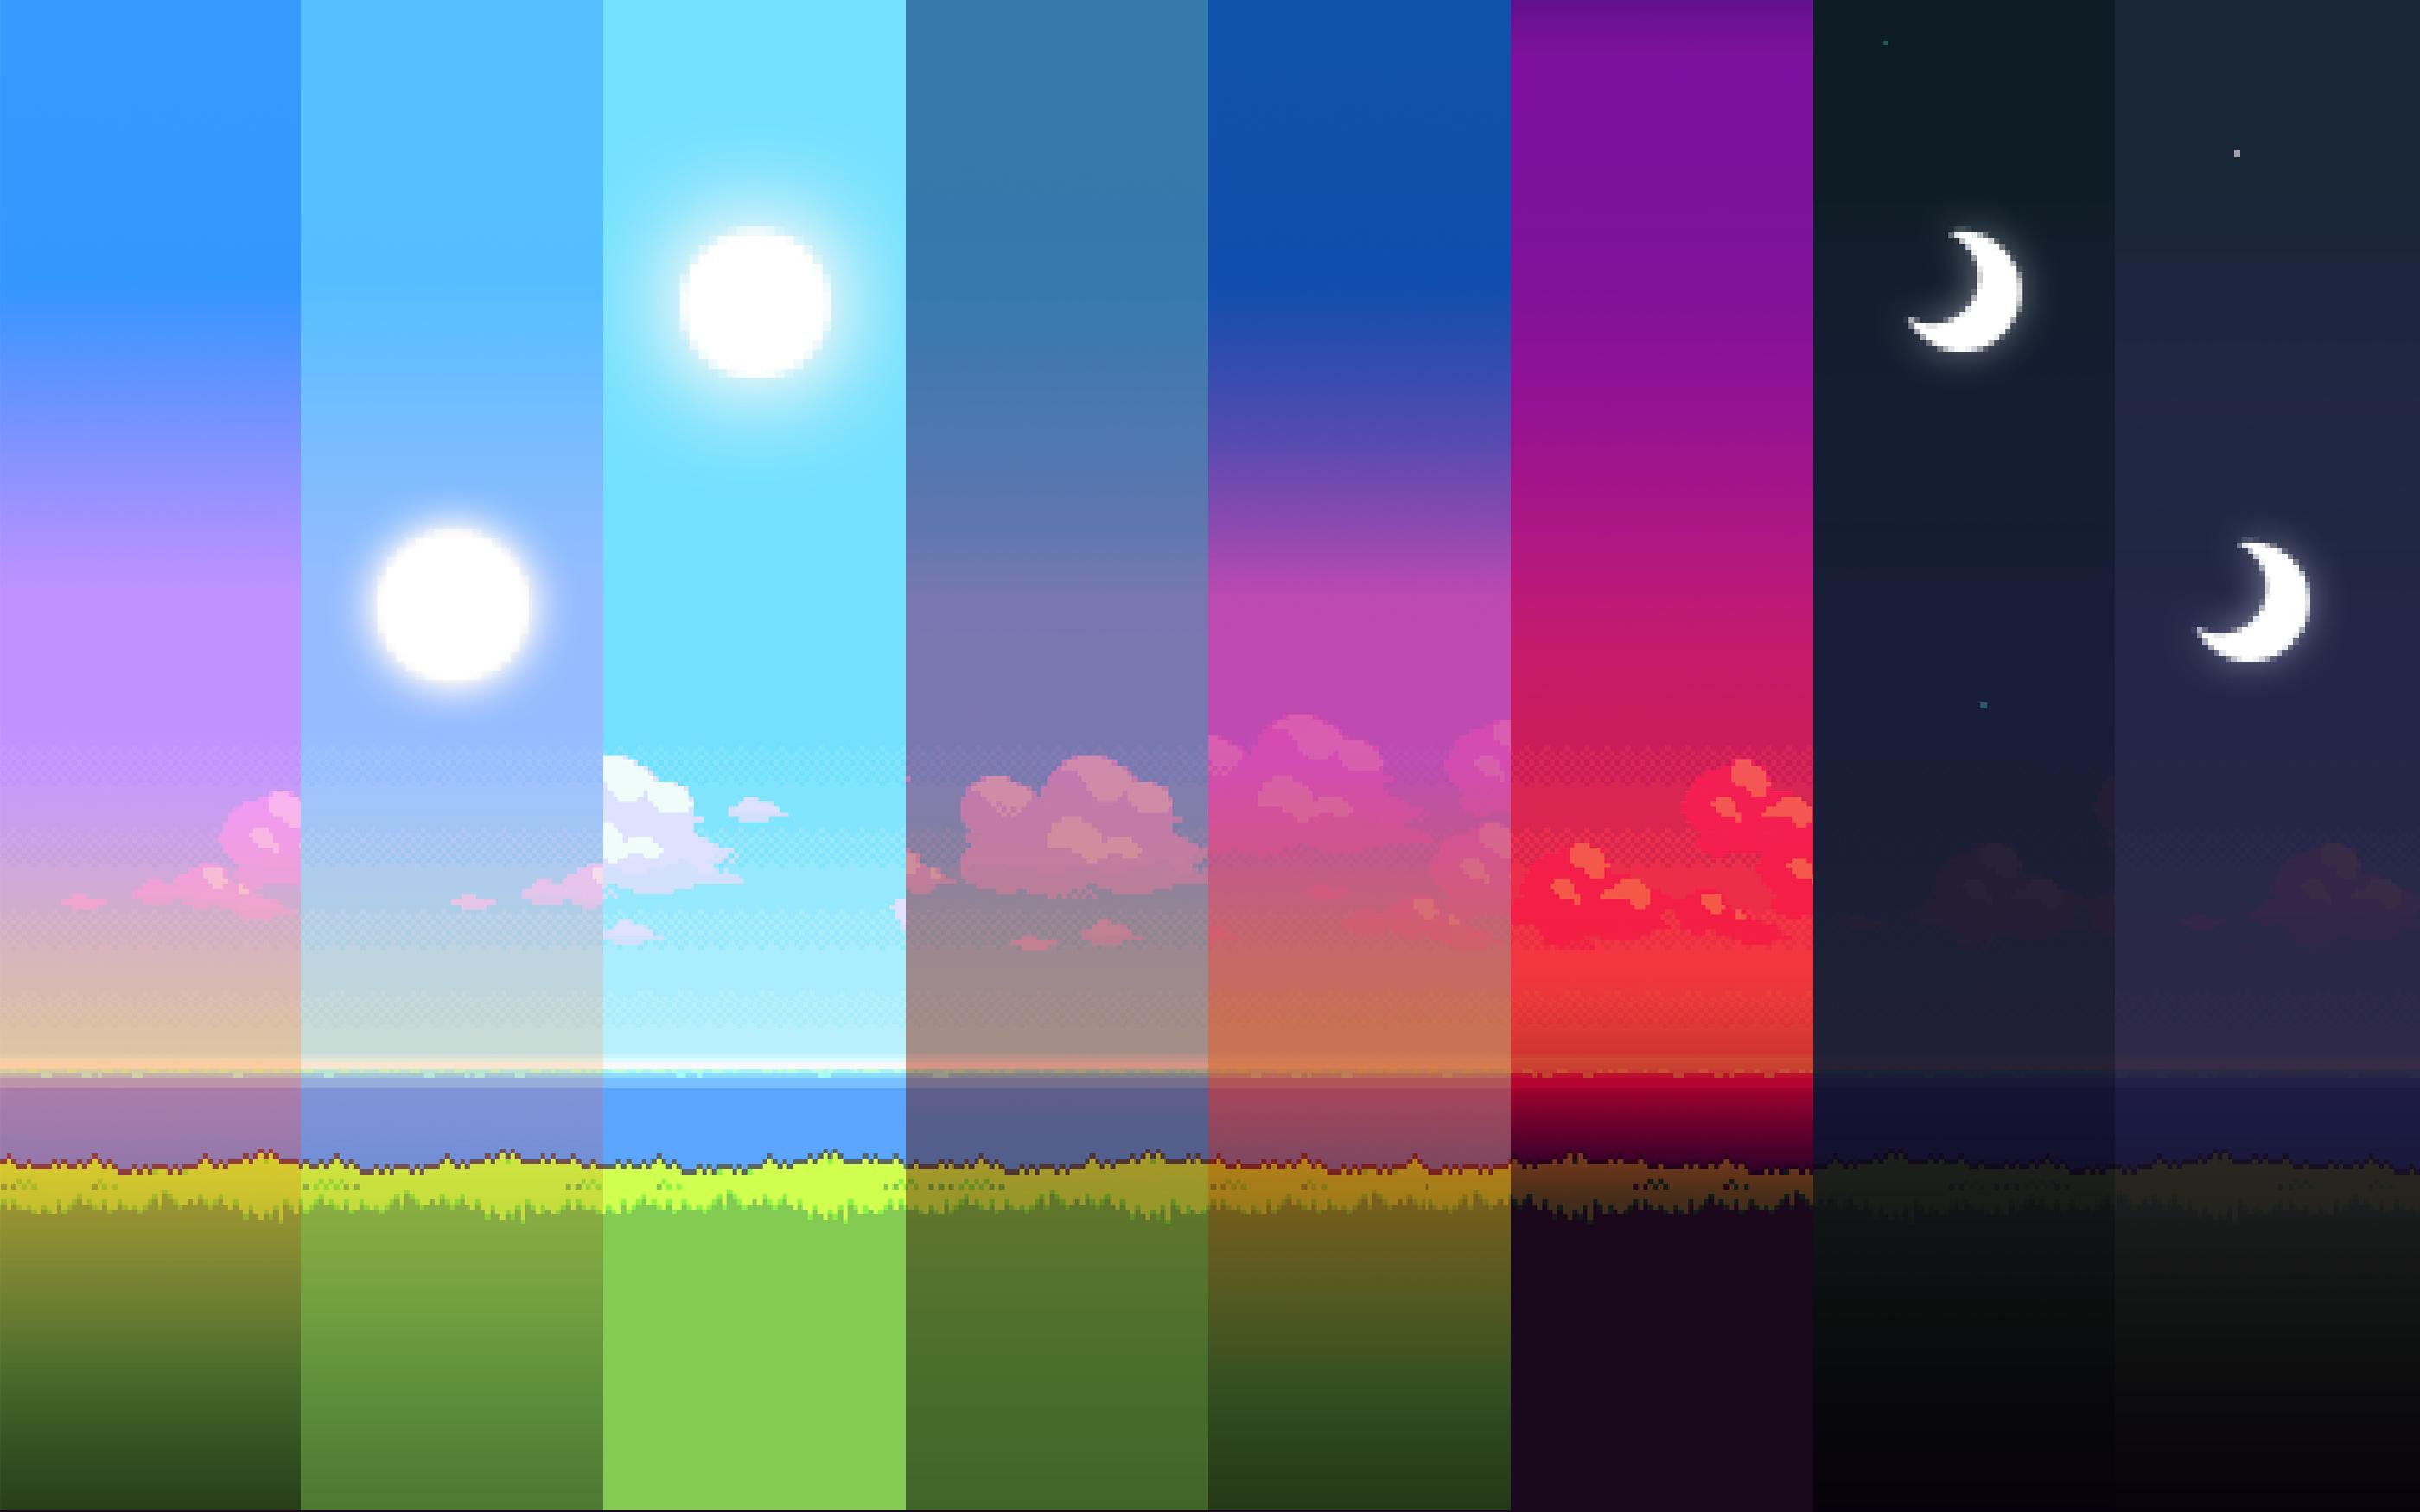 8 bit pixel art wallpaper